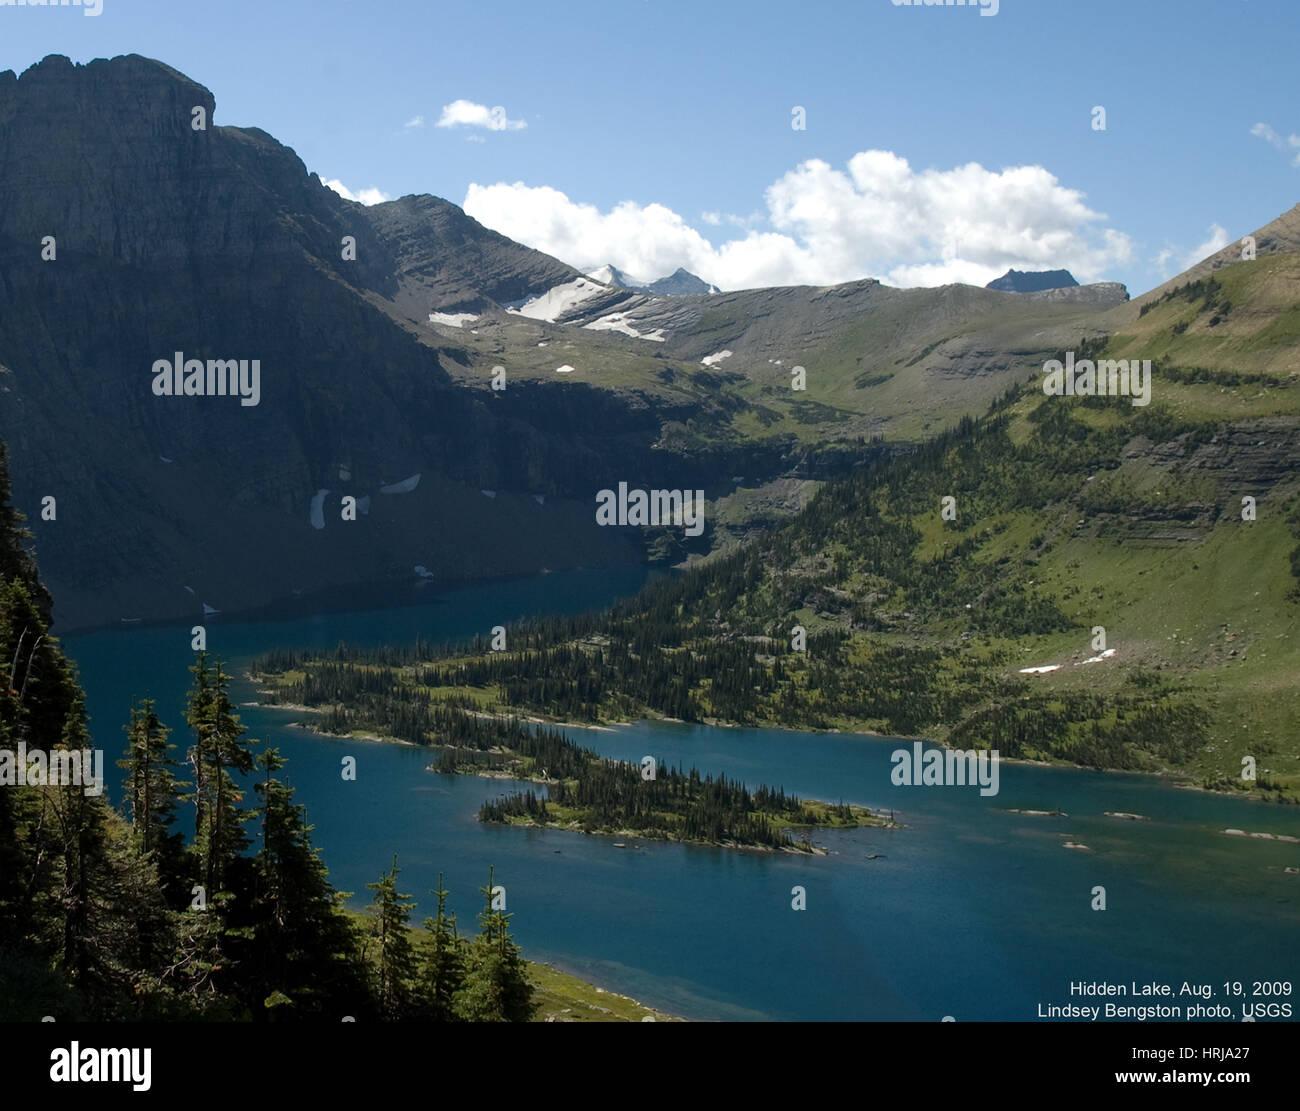 Hidden Lake, Glacier NP, 2009 - Stock Image